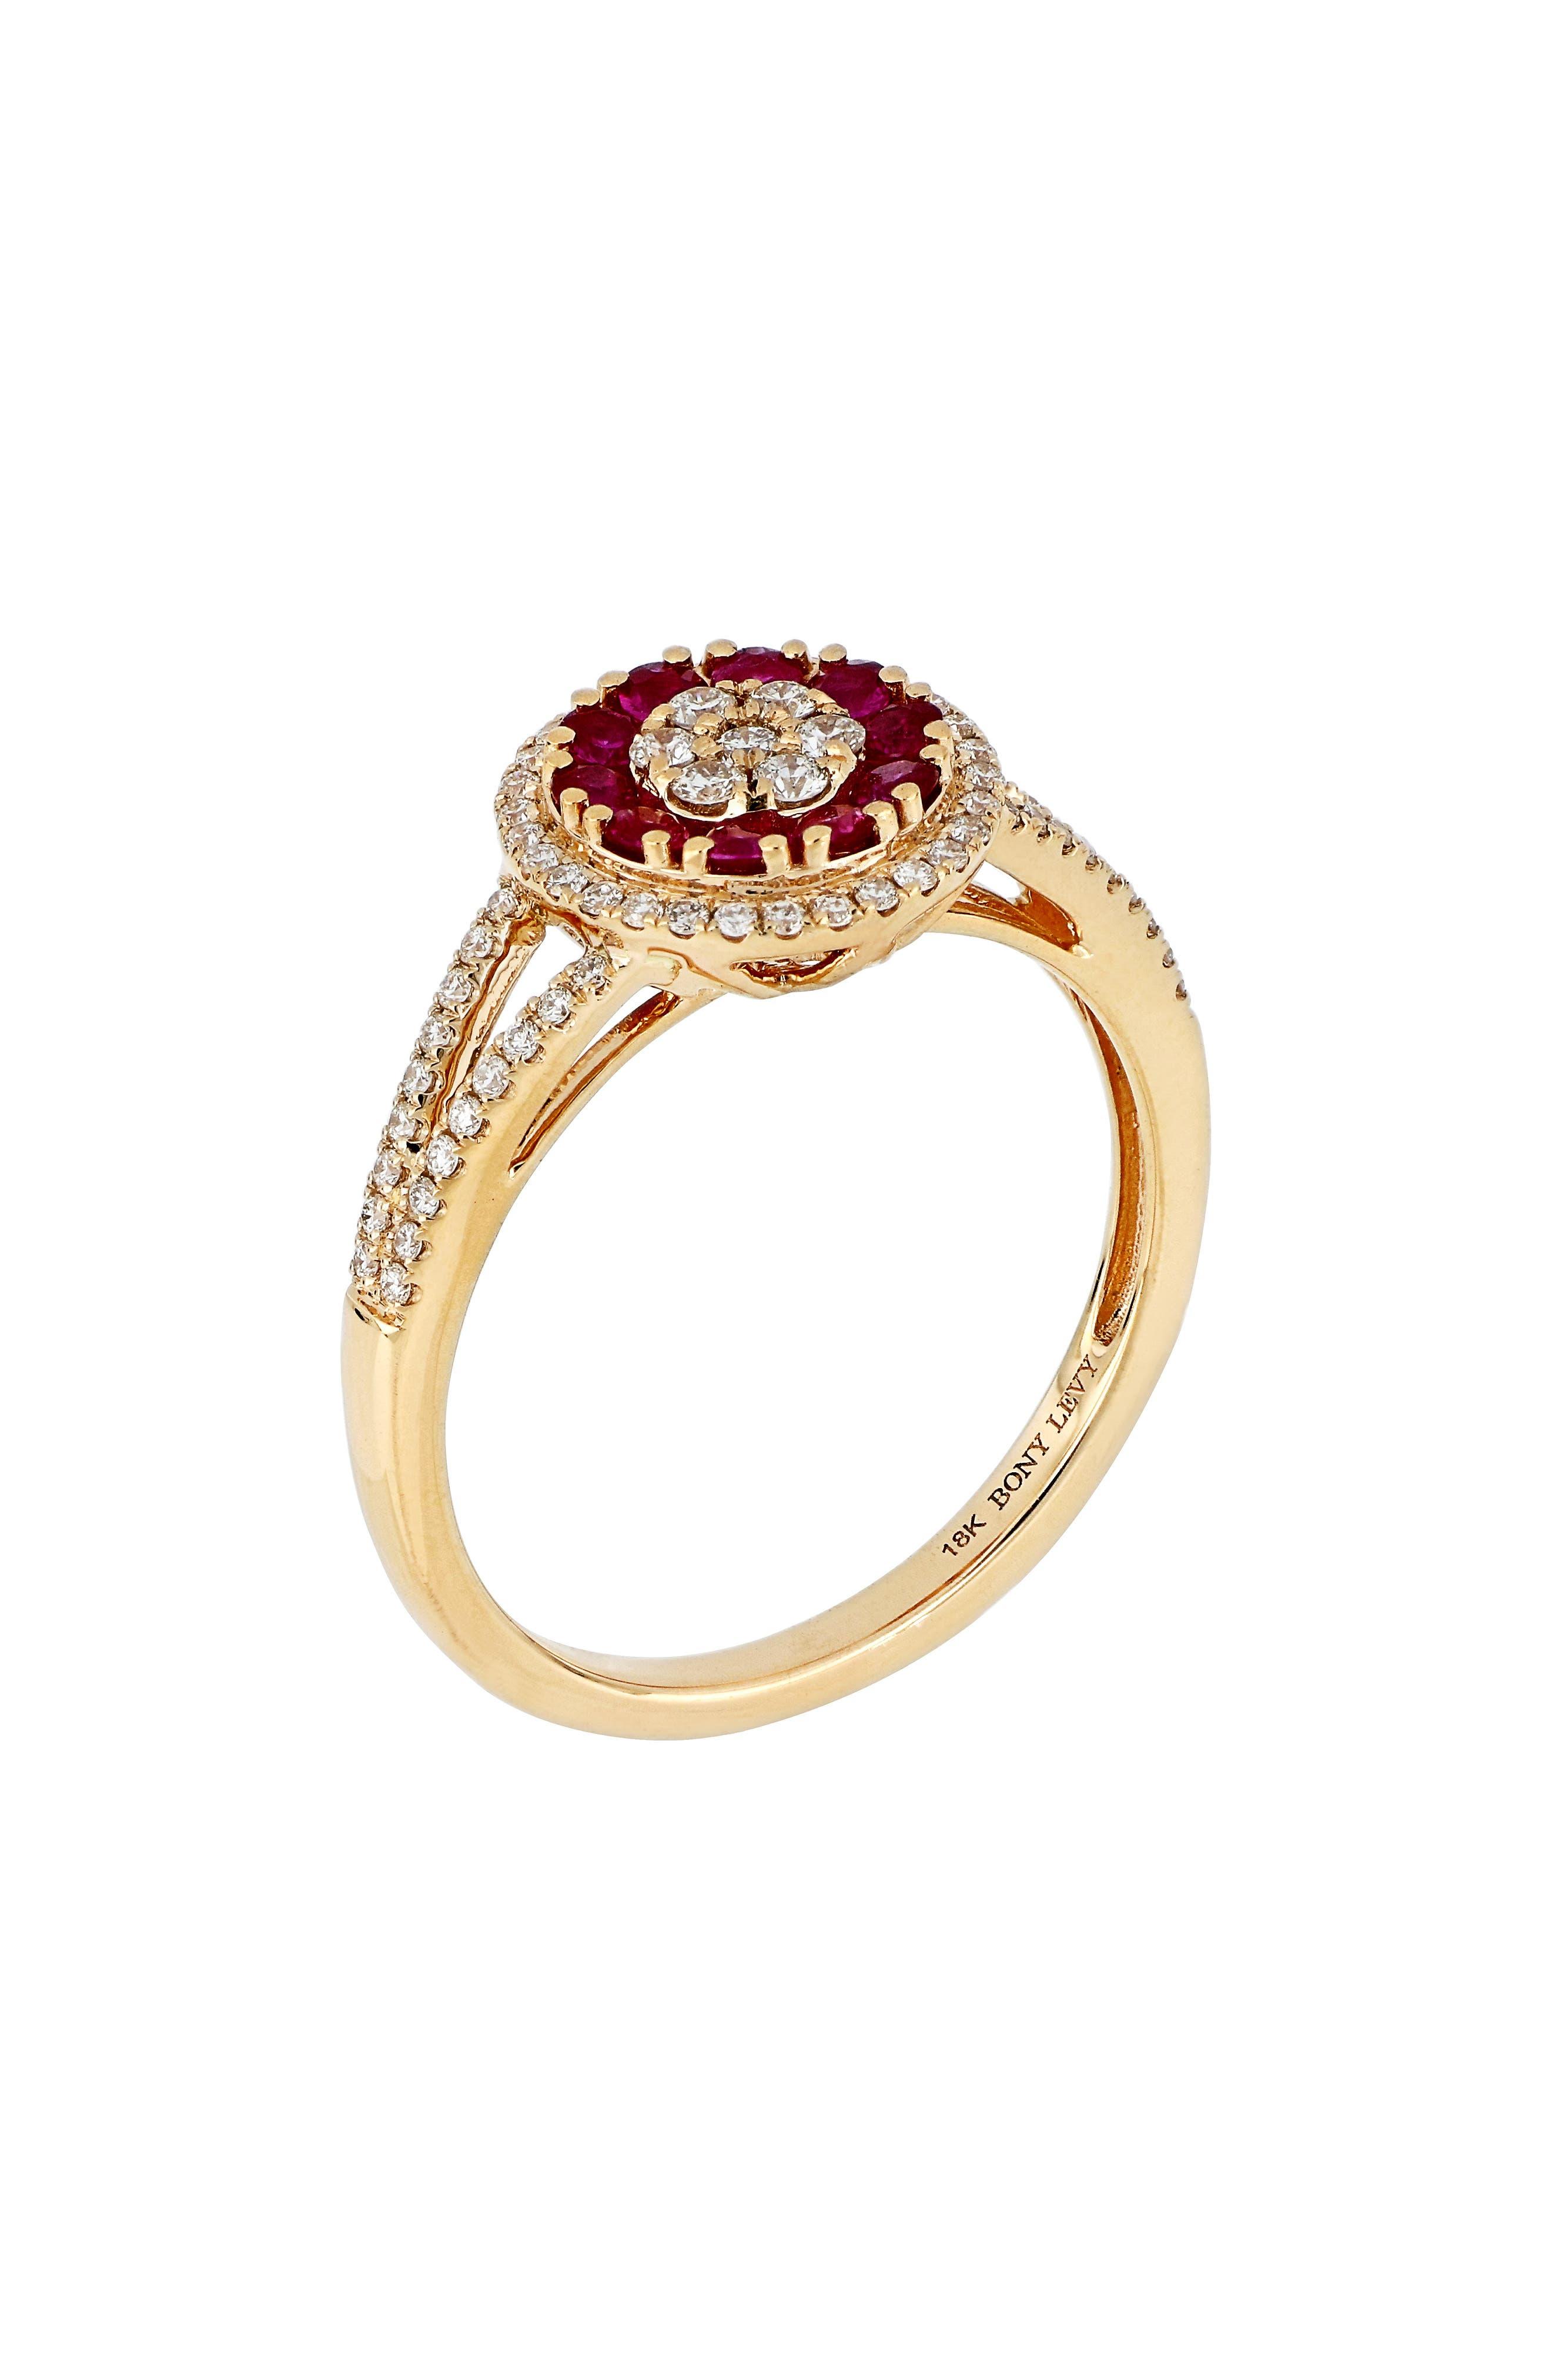 Gemstone & Diamond Ring,                             Main thumbnail 1, color,                             ROSE GOLD/ RUBY